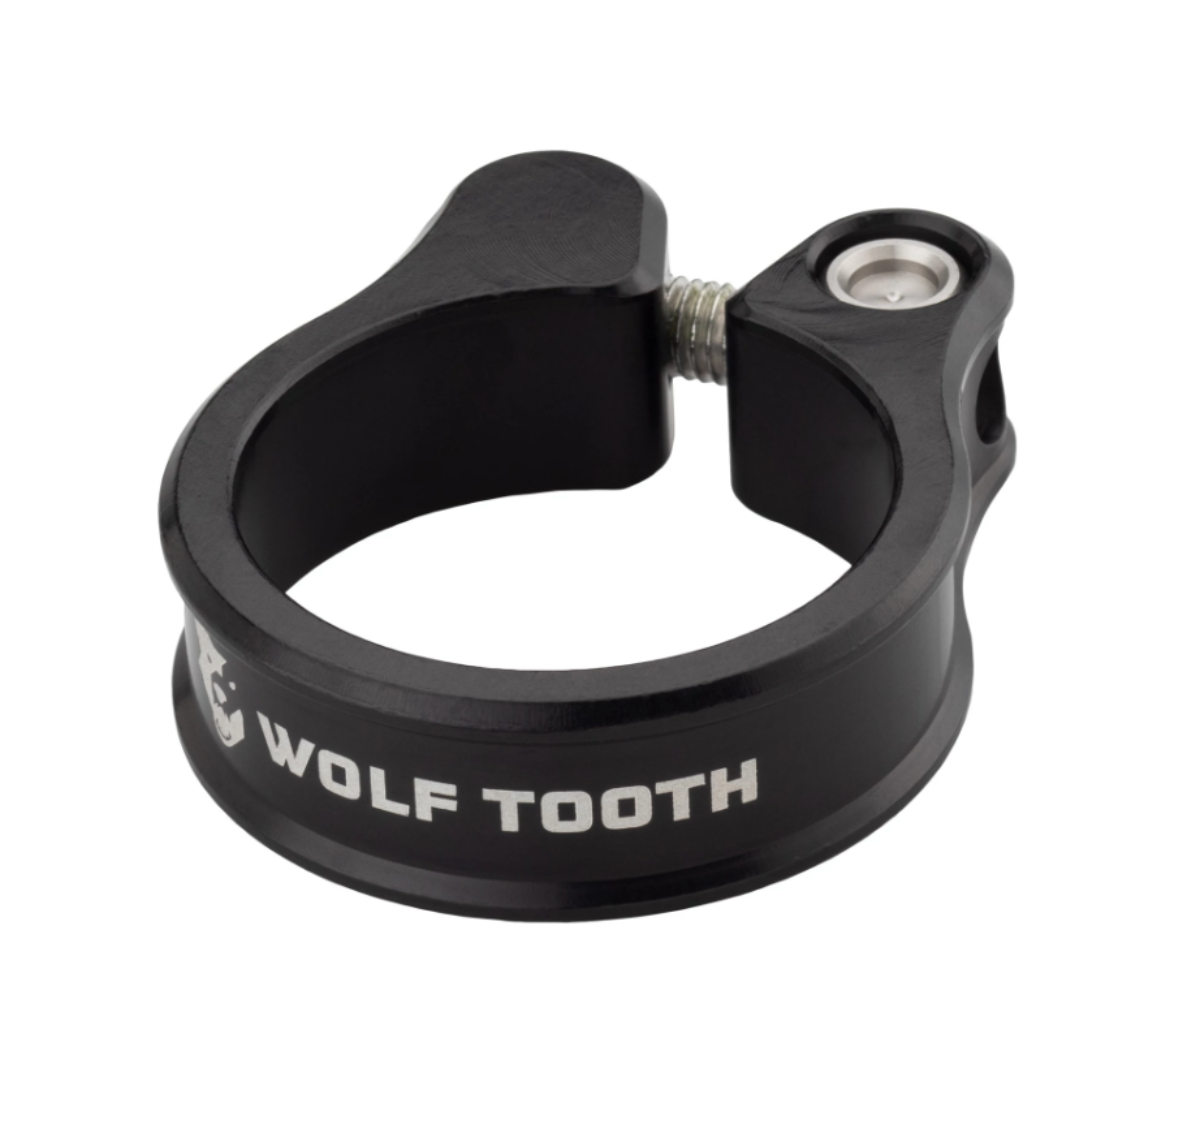 Wolf Tooth 34,9mm setepinne klemme